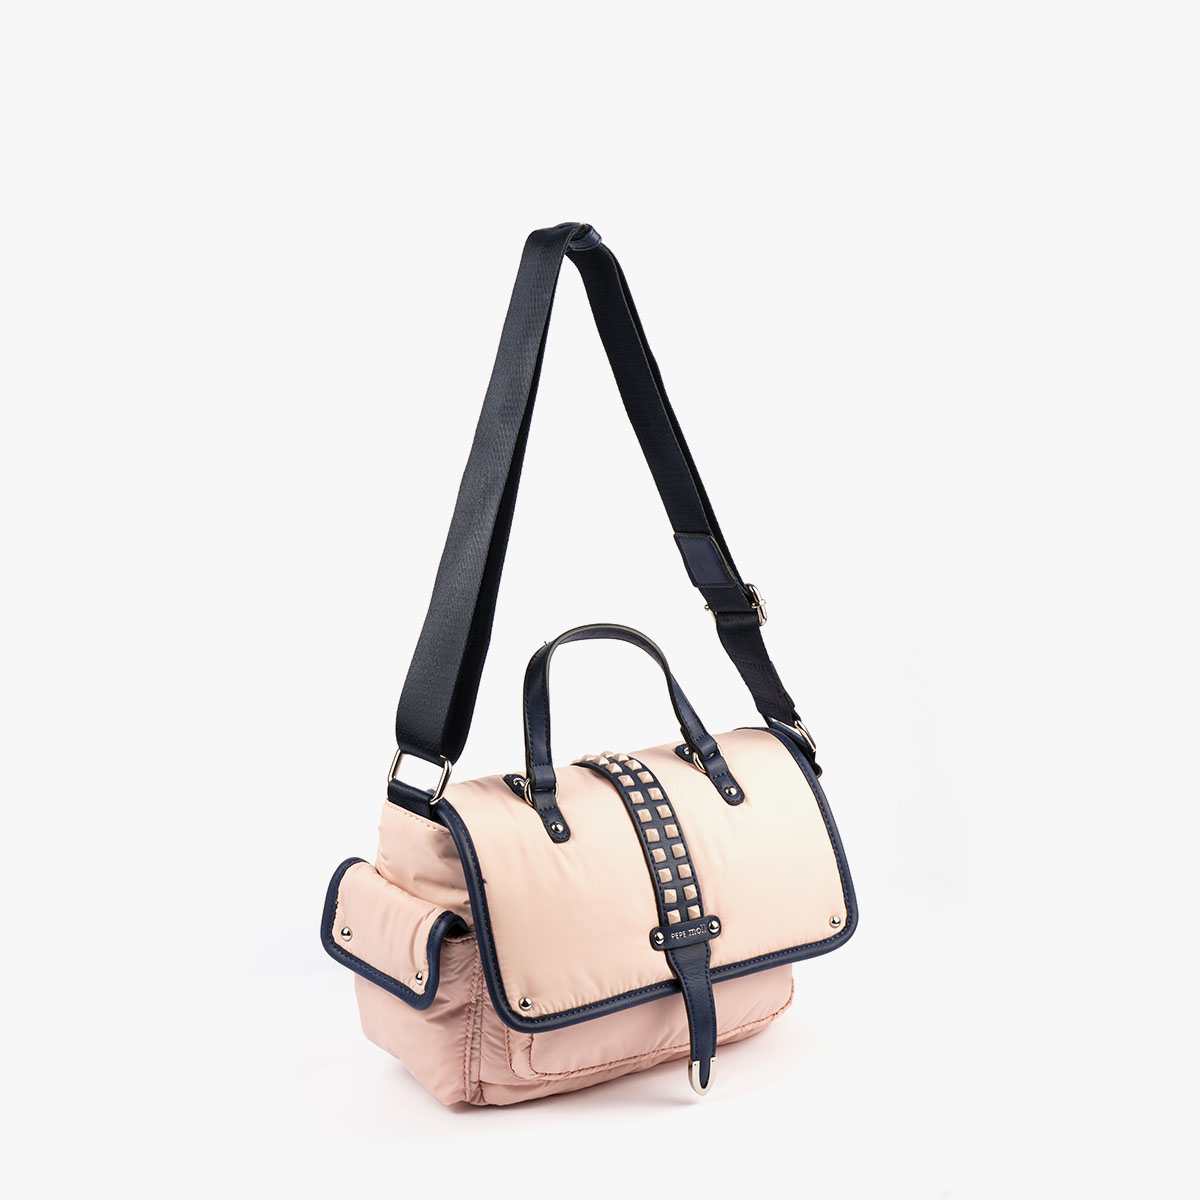 20126 bolso bandolera rosa pepemoll